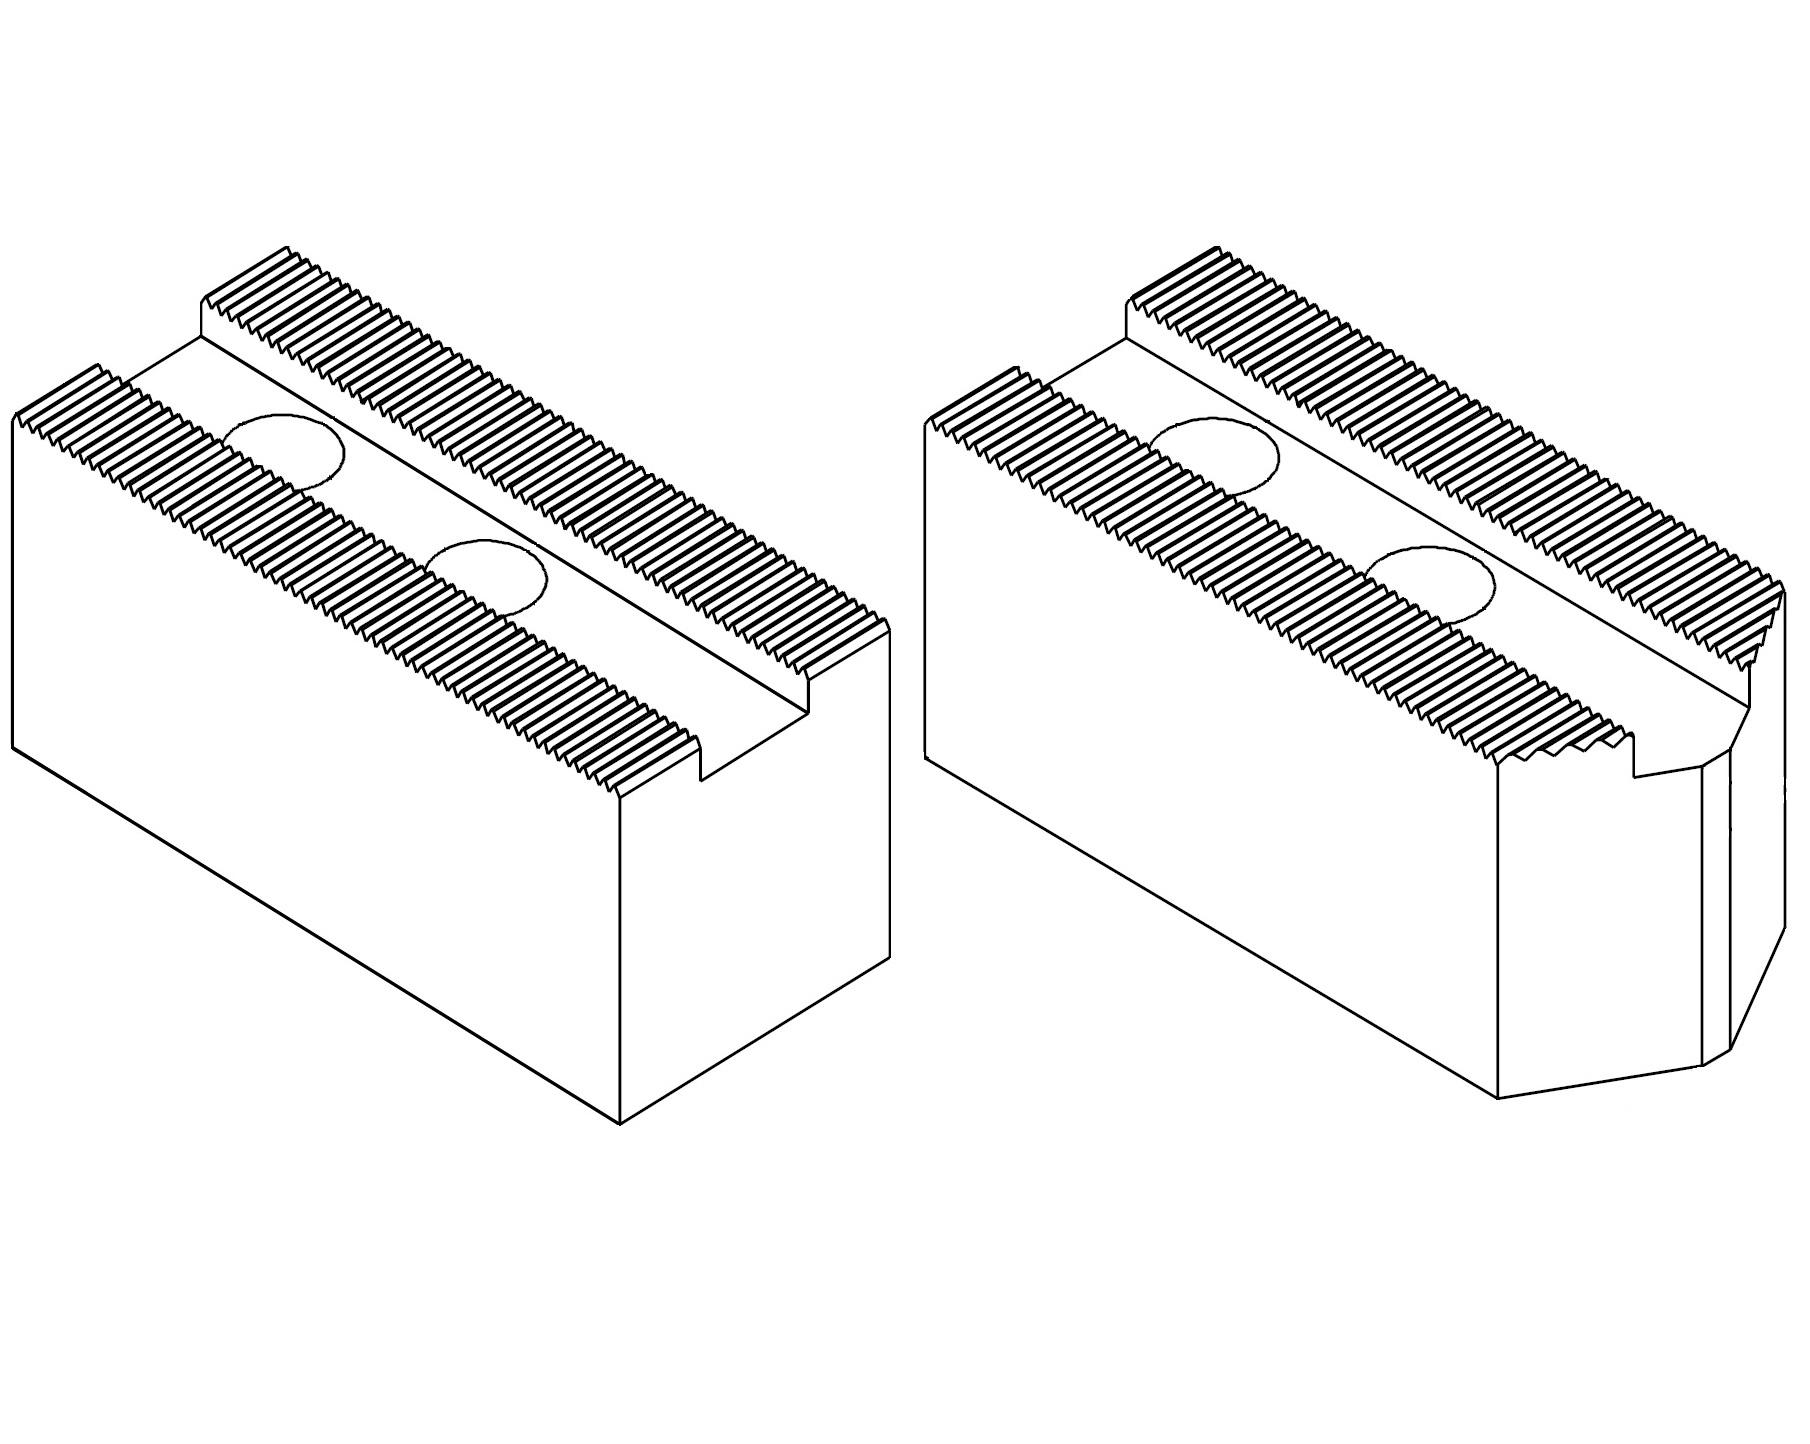 Čelisti měkké 1,5x60°, šířka drážky - 14 (sklíčidla pr. 210mm)